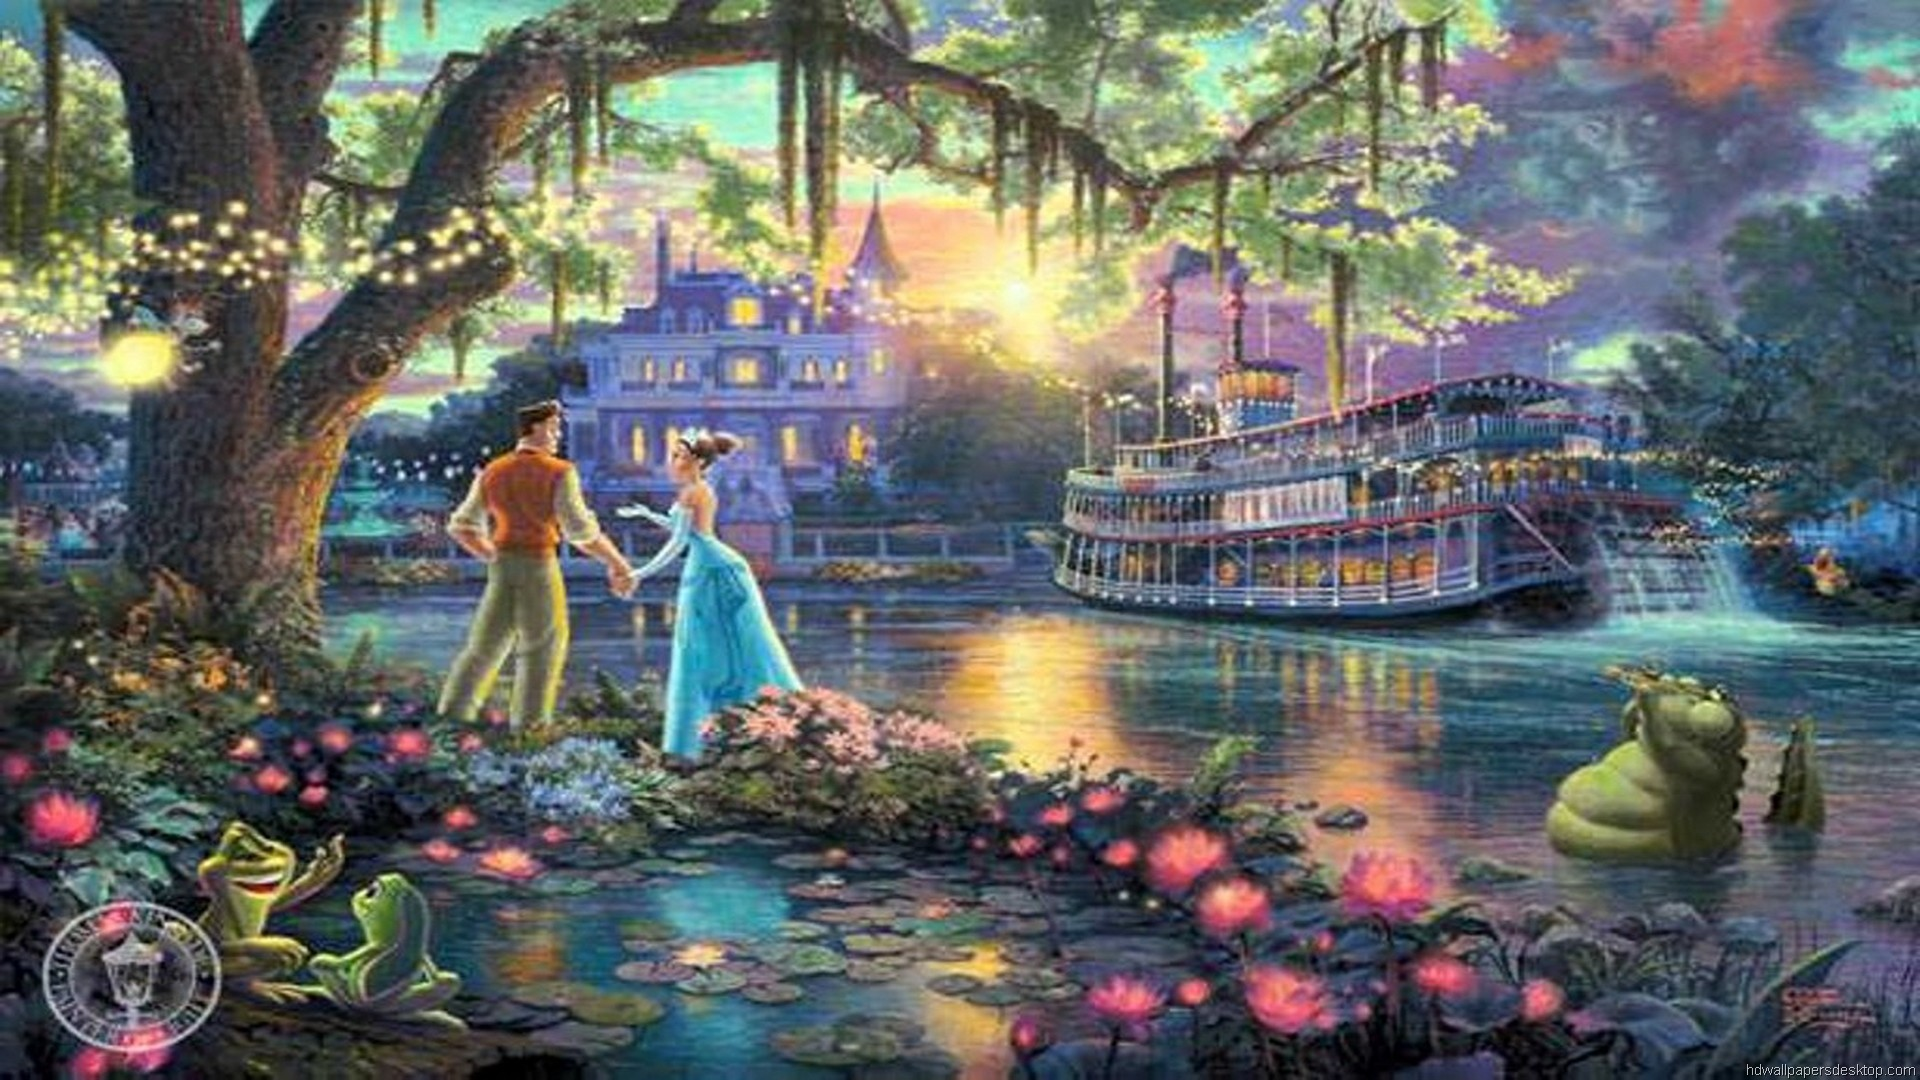 Thomas Kinkade Fall Wallpaper Thomas Kinkade Disney Wallpaper 183 ① Wallpapertag